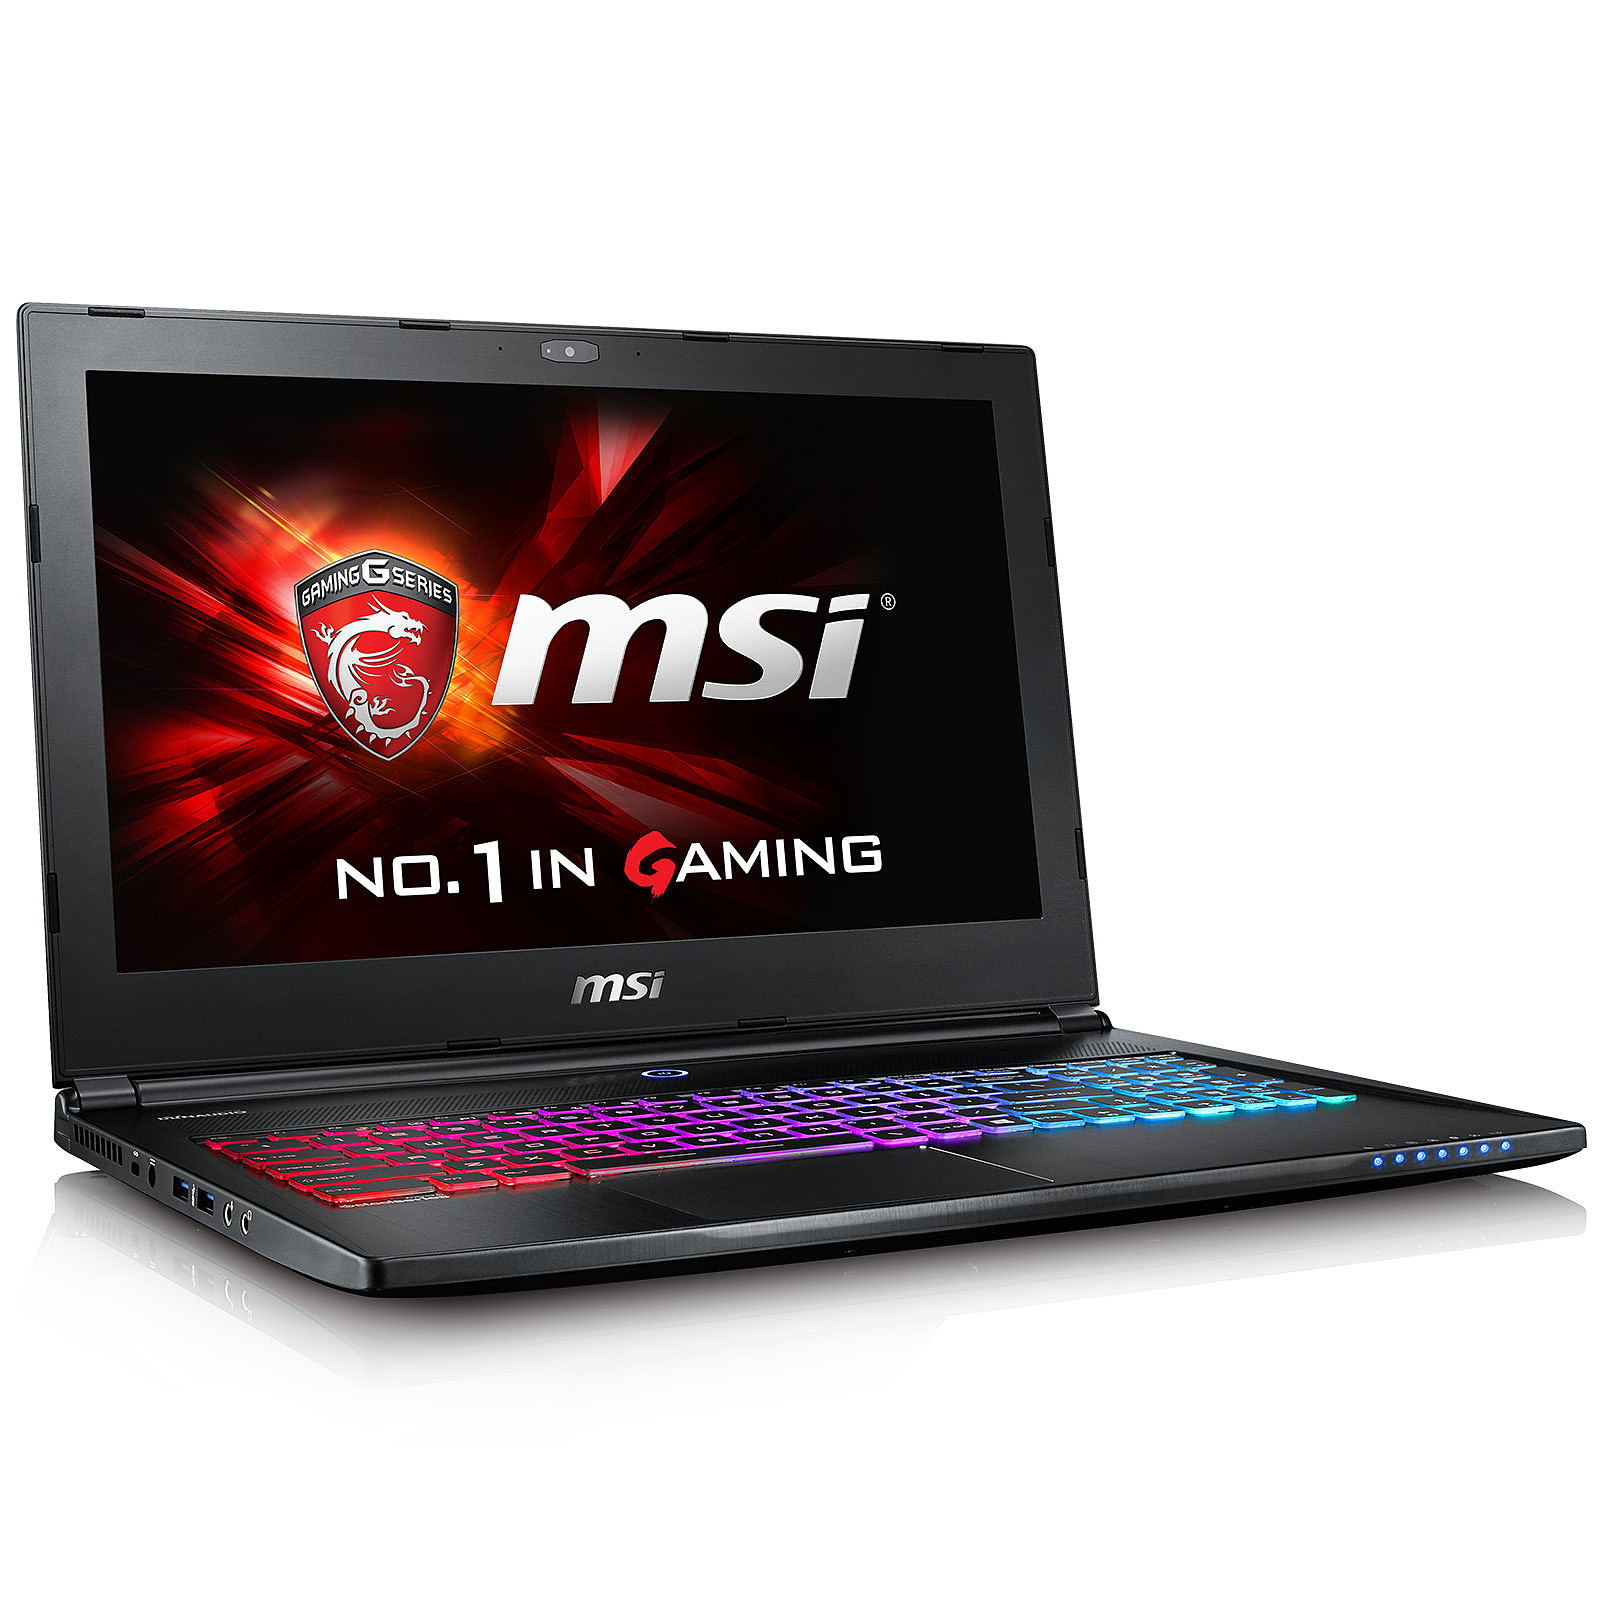 MSI GS60 6QE-022FR Ghost Pro 4K